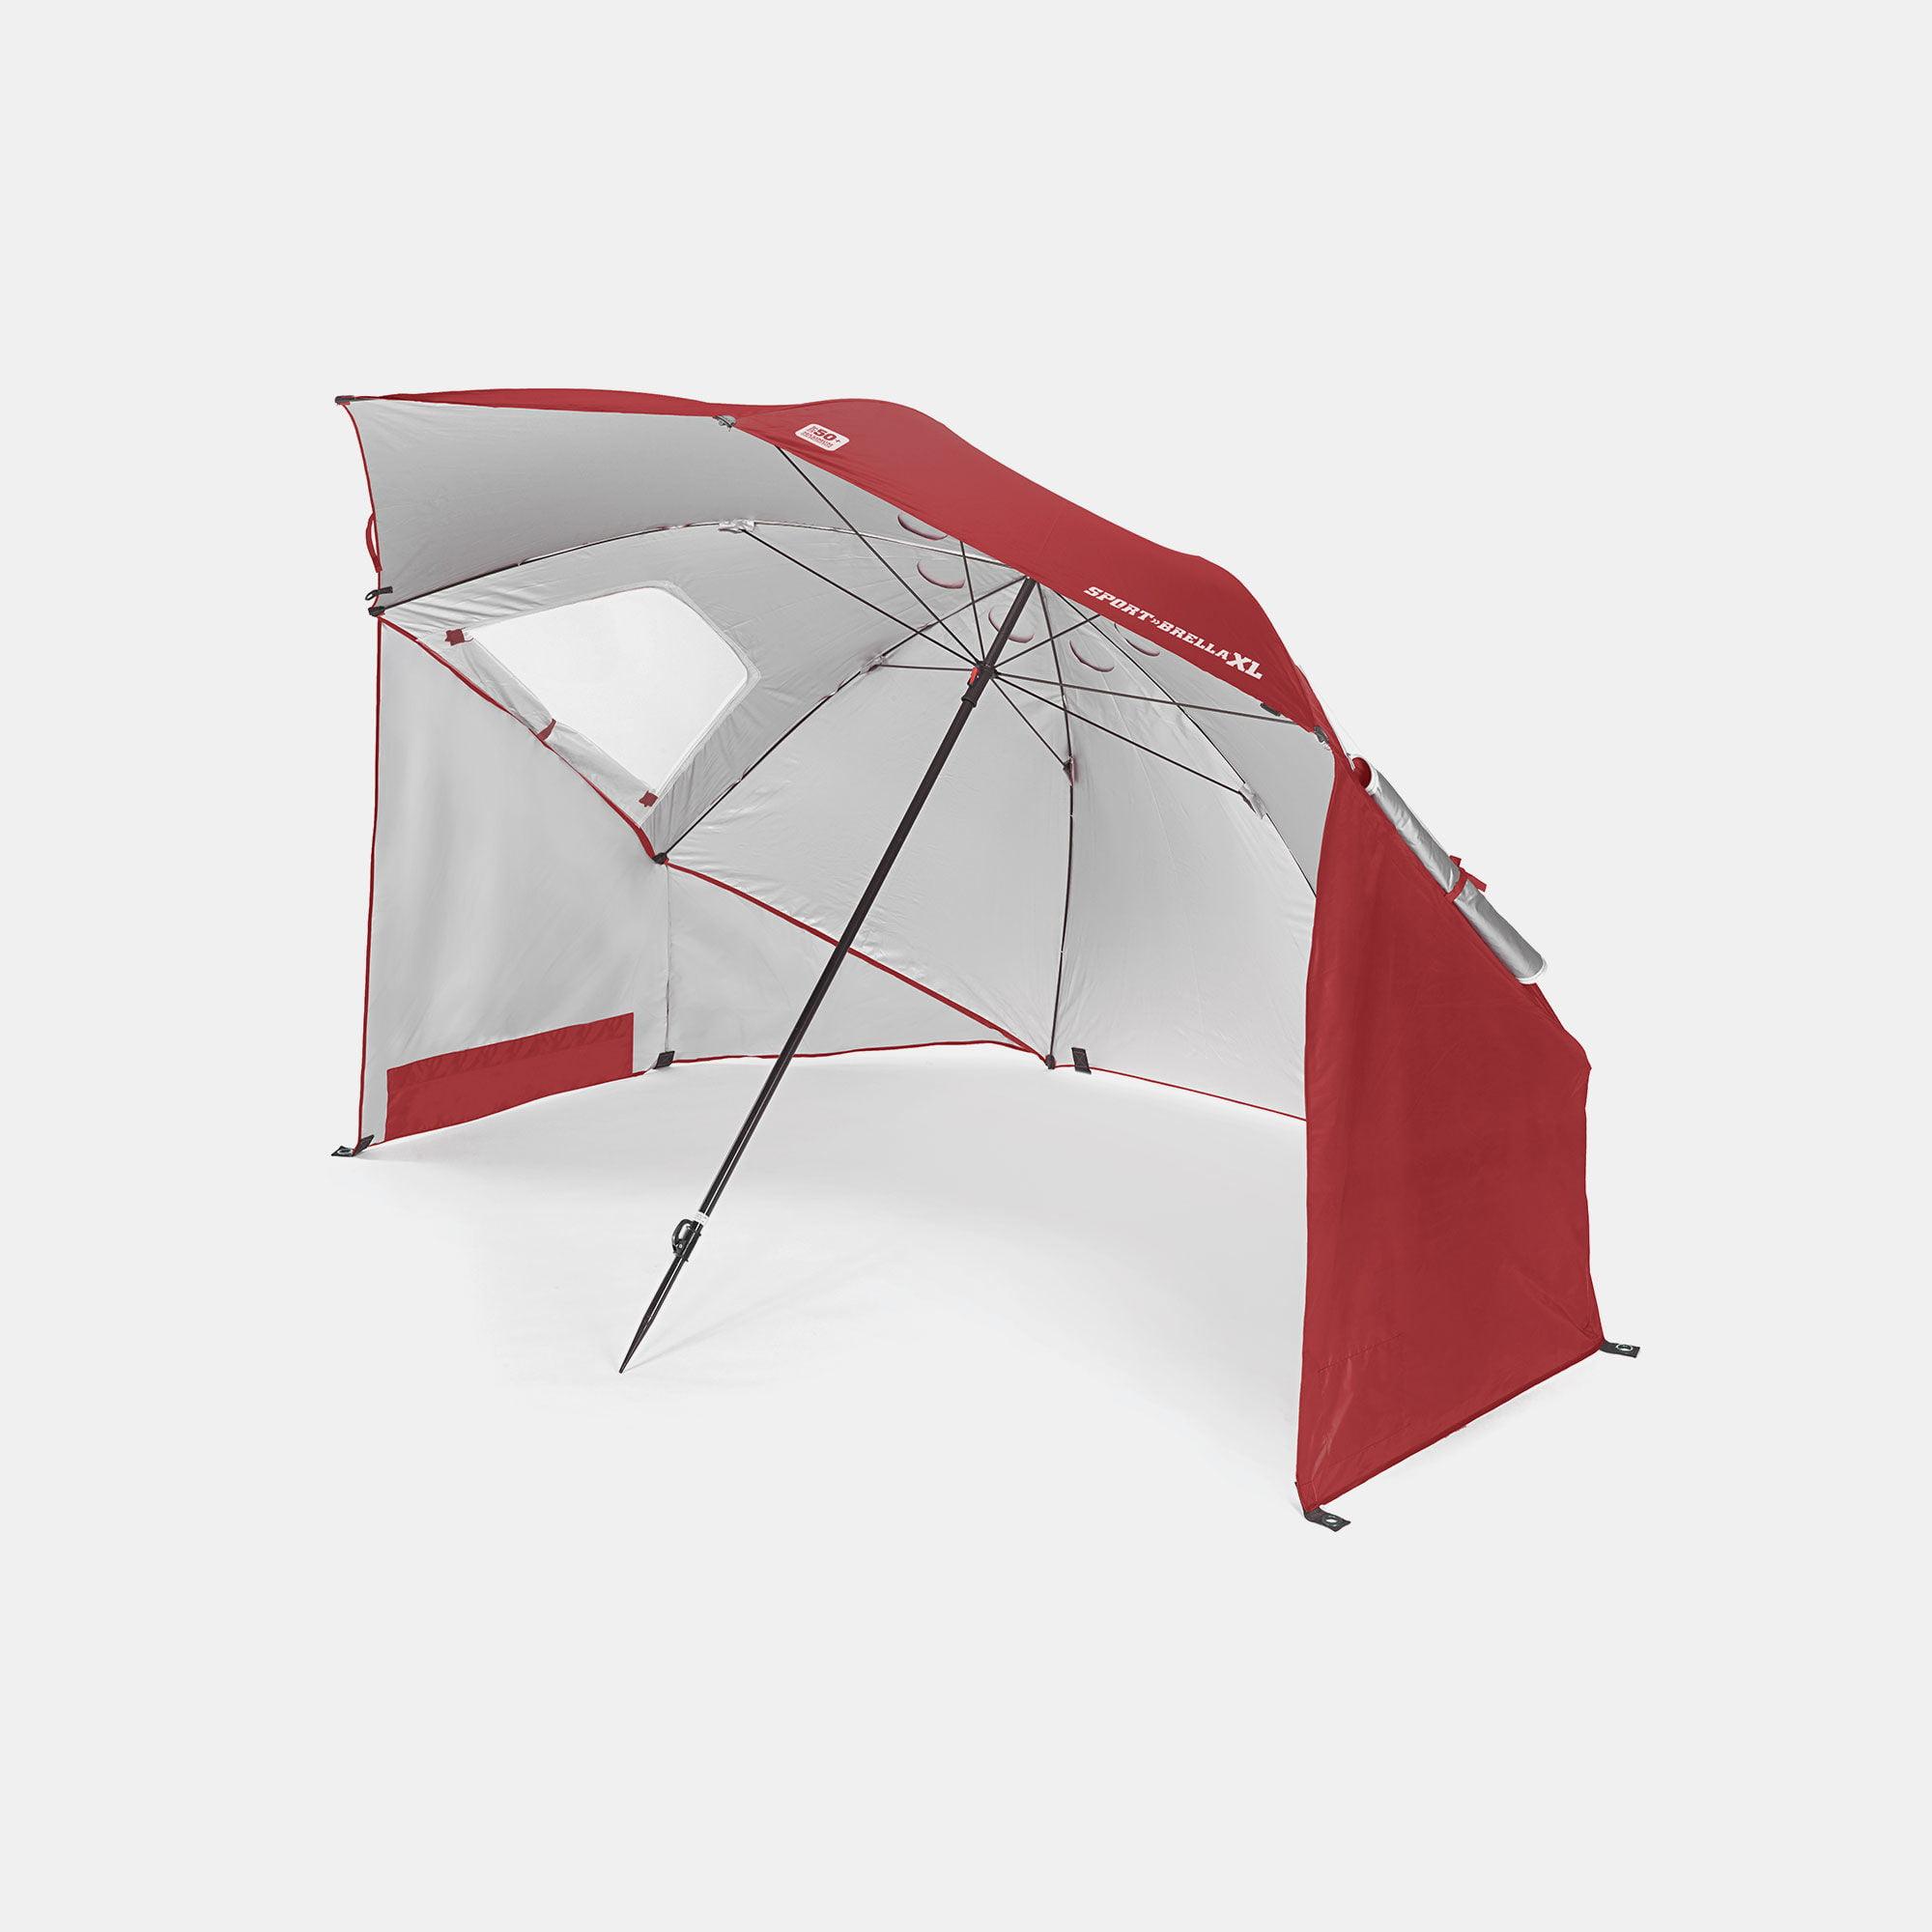 Sport-Brella XL Umbrella Portable Canopy, Deep Red by Sport-Brella